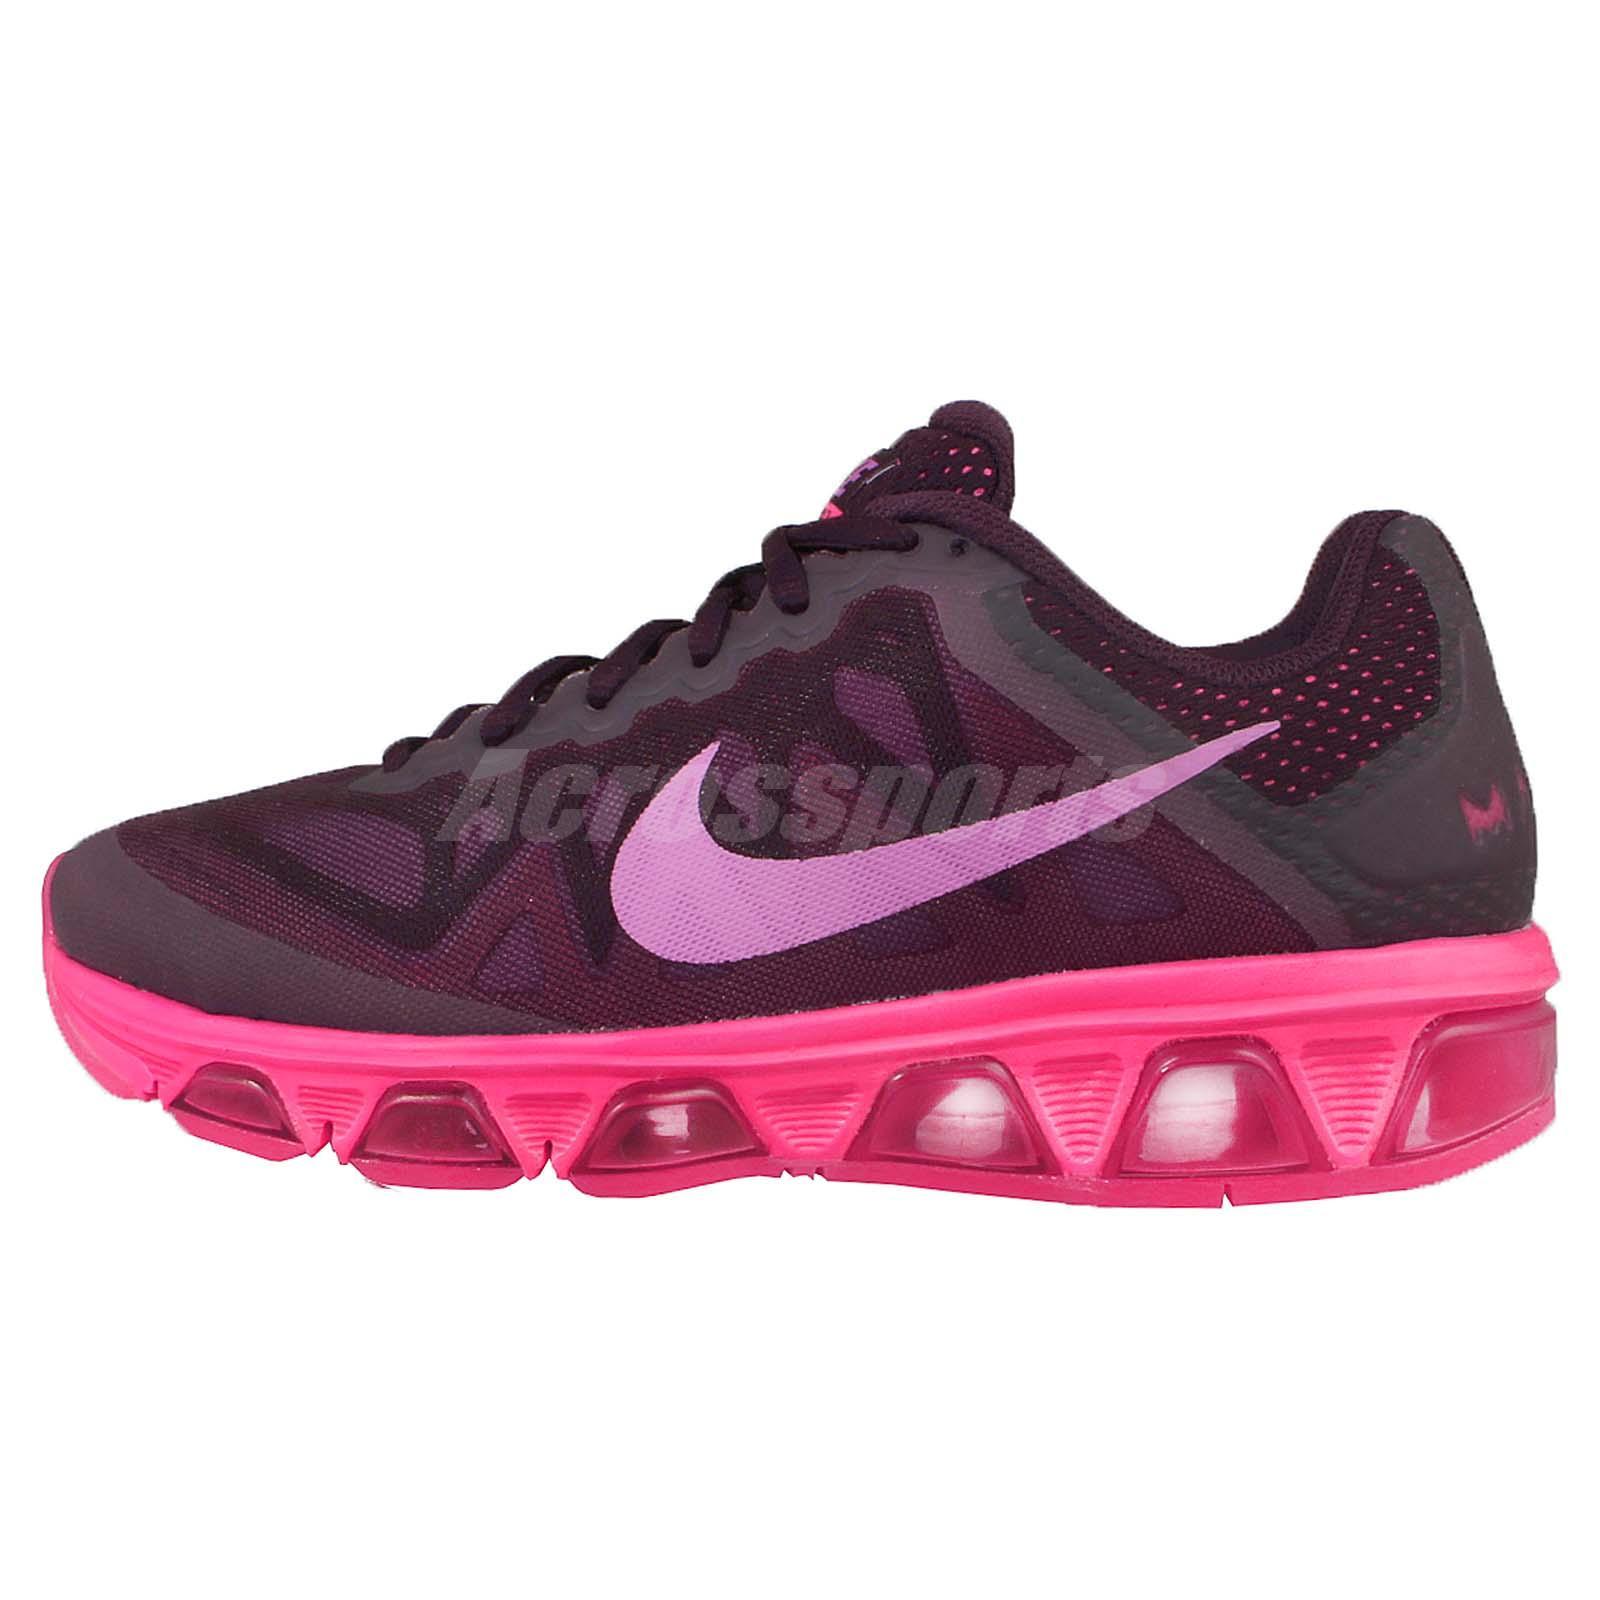 6f32f24cf2 ... canada nike air max tailwind 3 running shoes womens cde48 20e5a